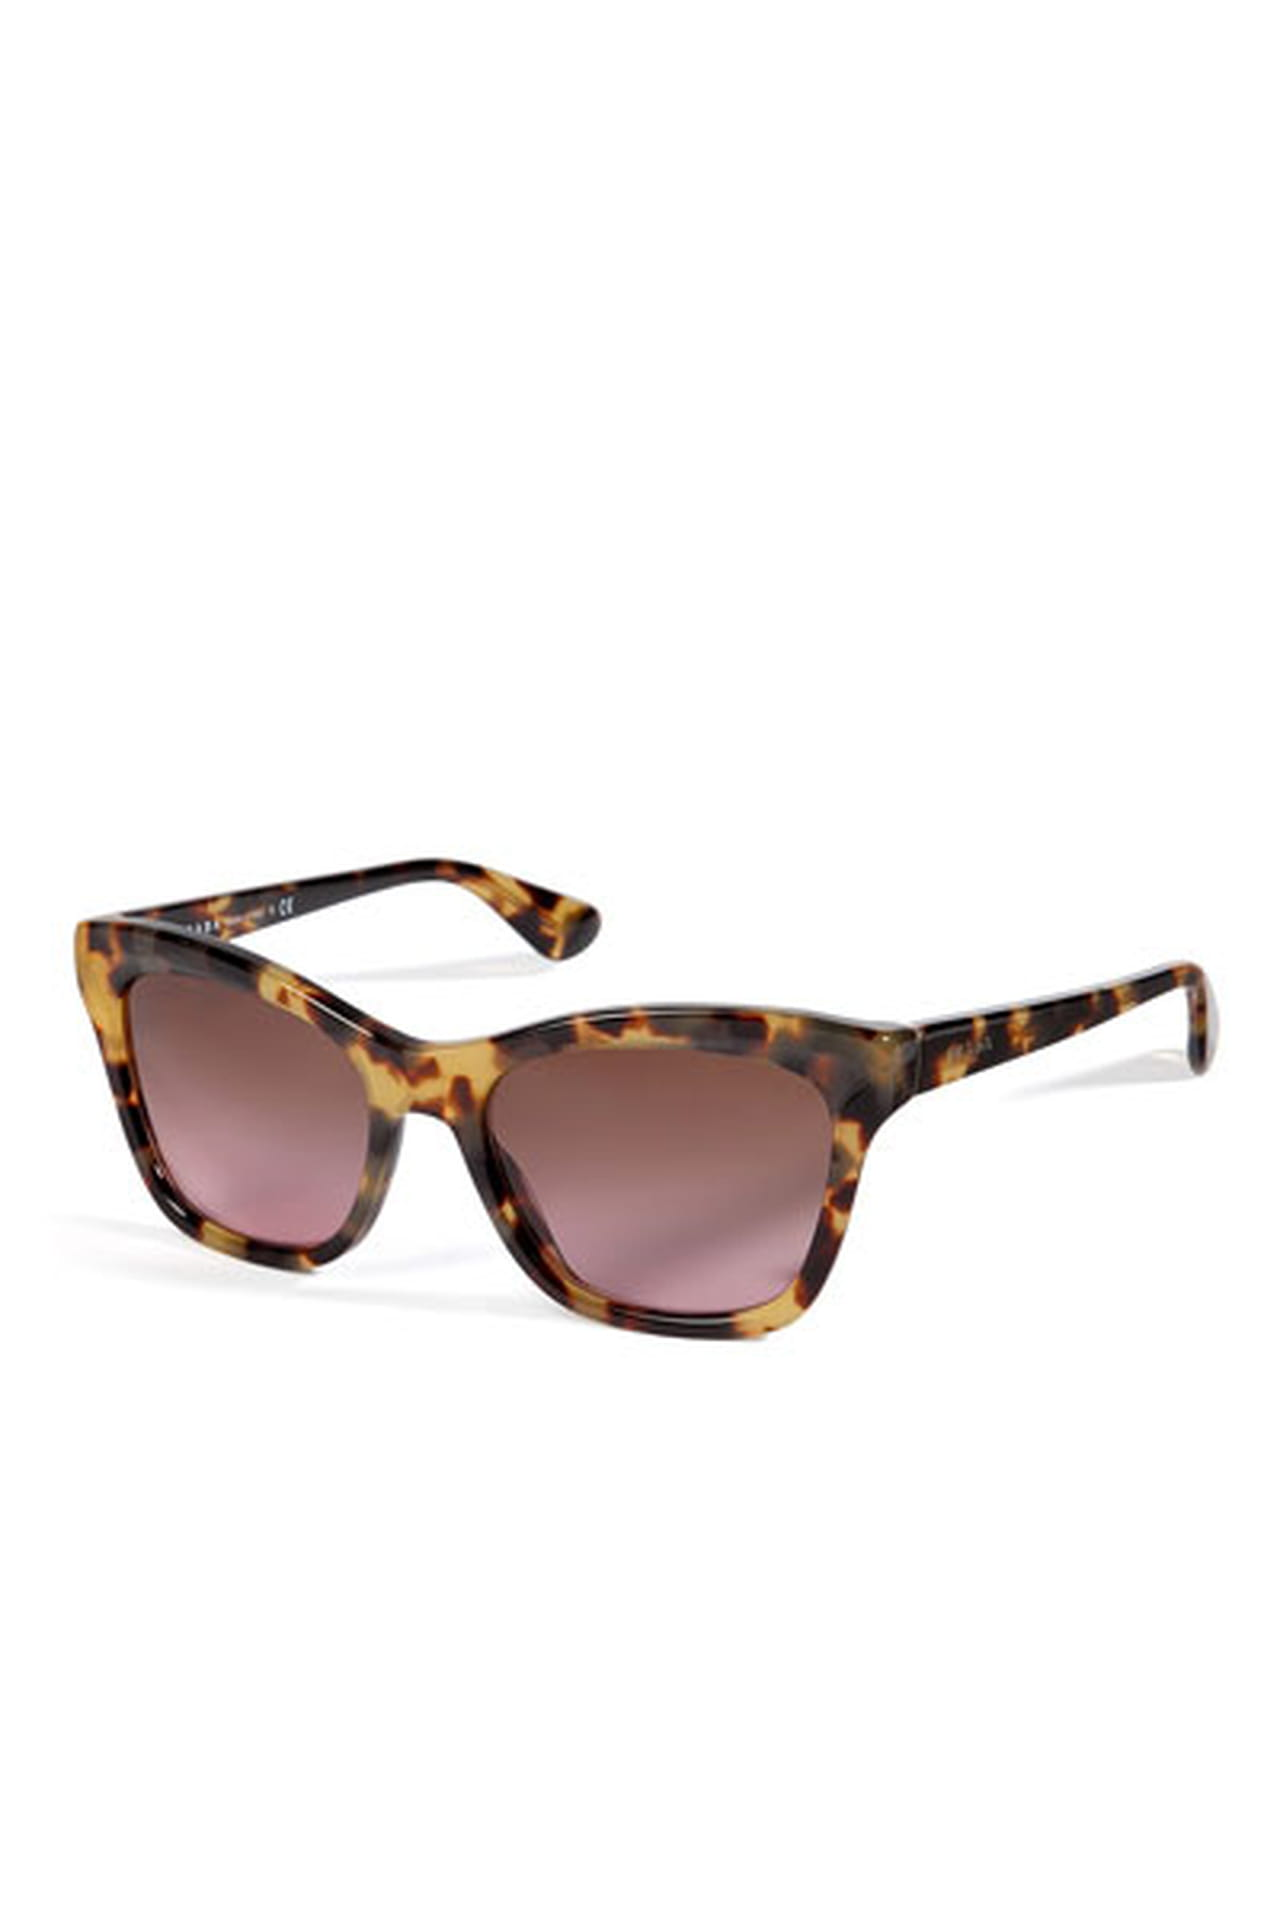 07d60360c نظارة عصرية من برادا Prada وتتوفر بسعر 848 درهم إماراتي.